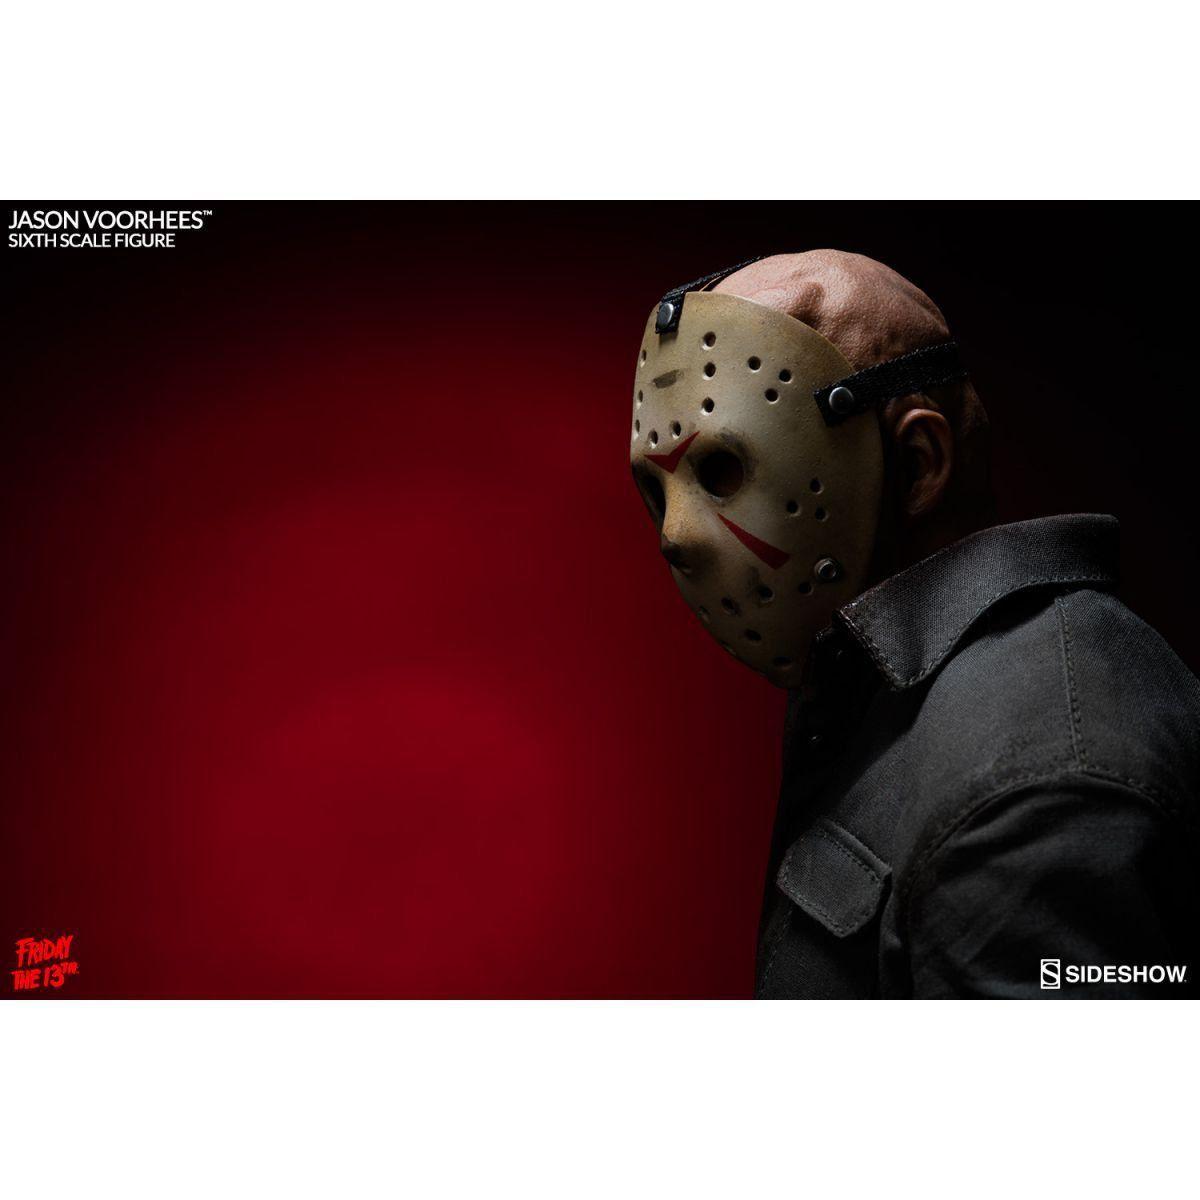 Boneco Jason Voorhees: Sexta-Feira 13 (Friday The 13th) Escala 1/6 - Sideshow - CD